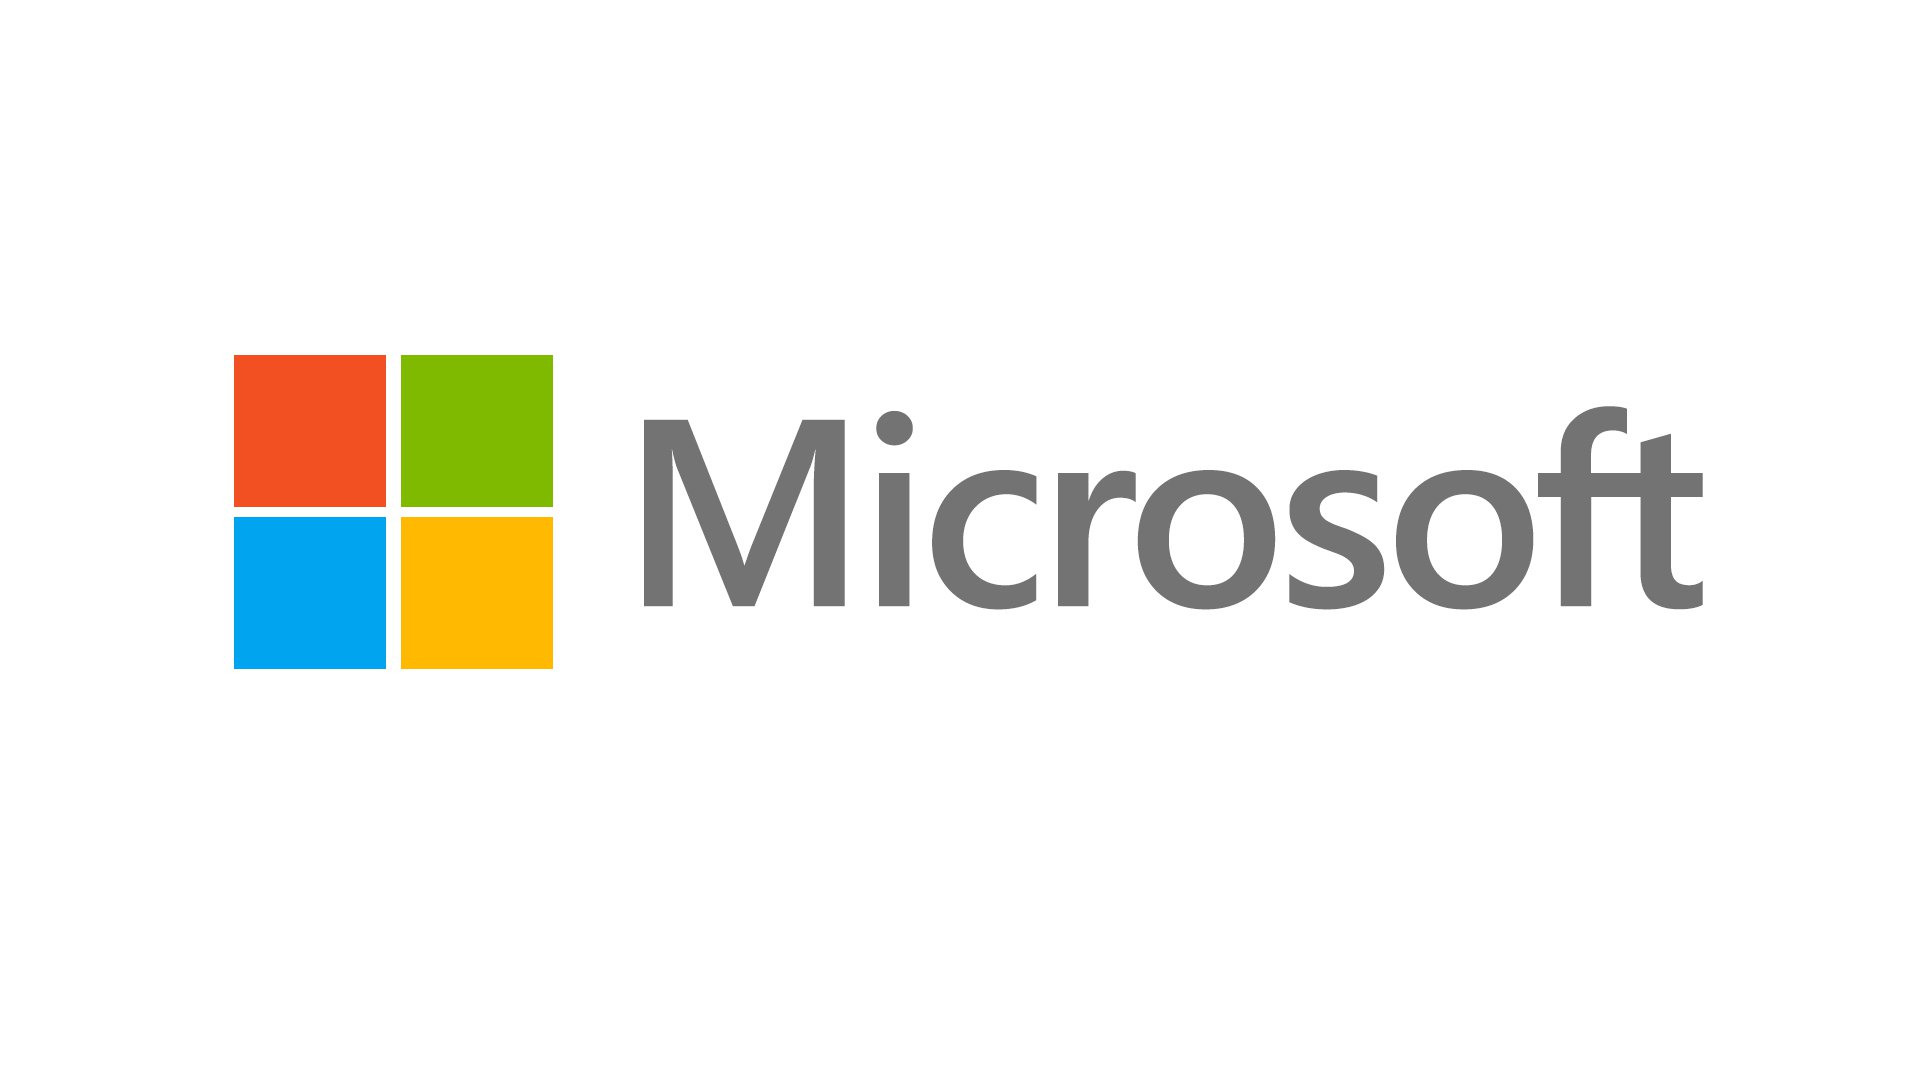 Microsoft Crescent